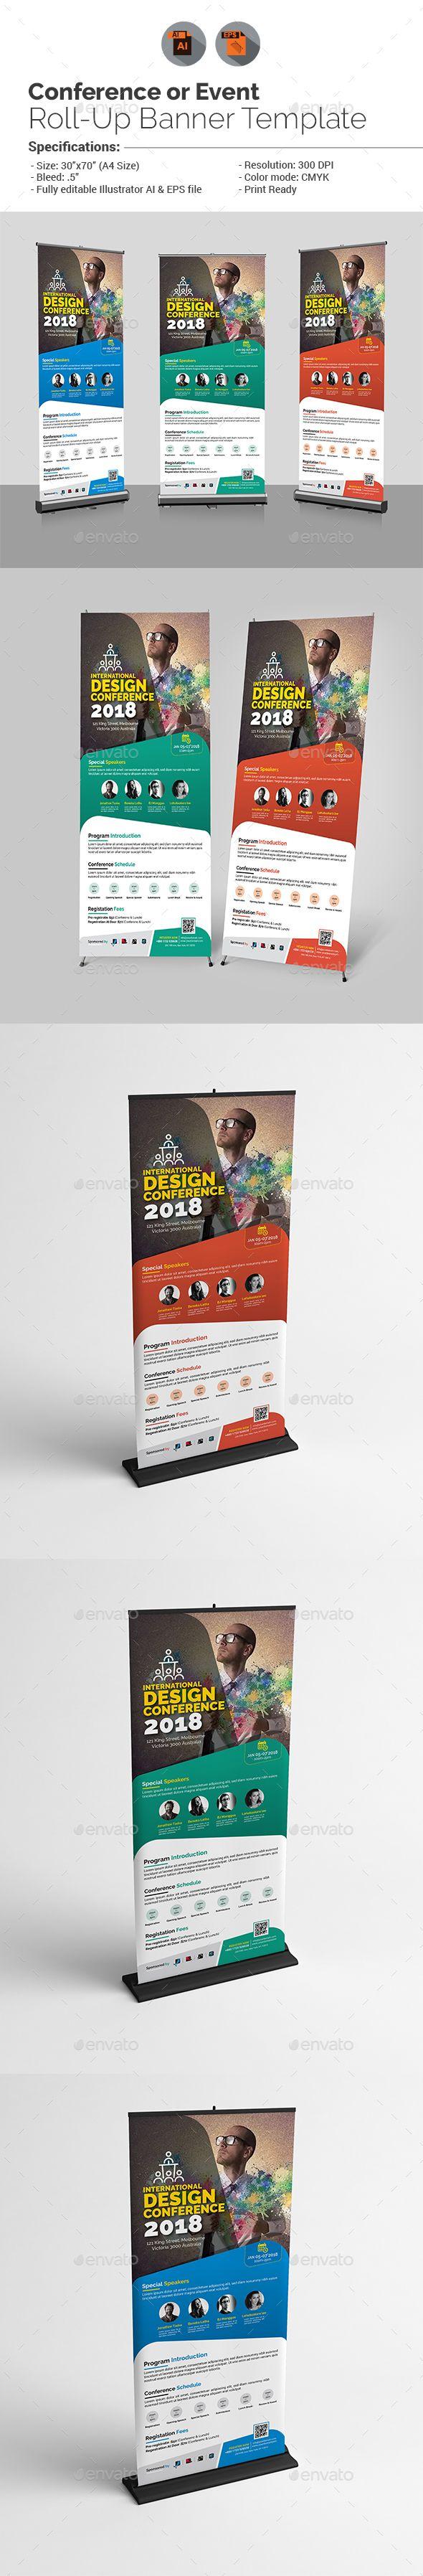 Design large banner in illustrator - Conference Or Event Roll Up Banner Ads Design Template Signage Rollup Print Design Template